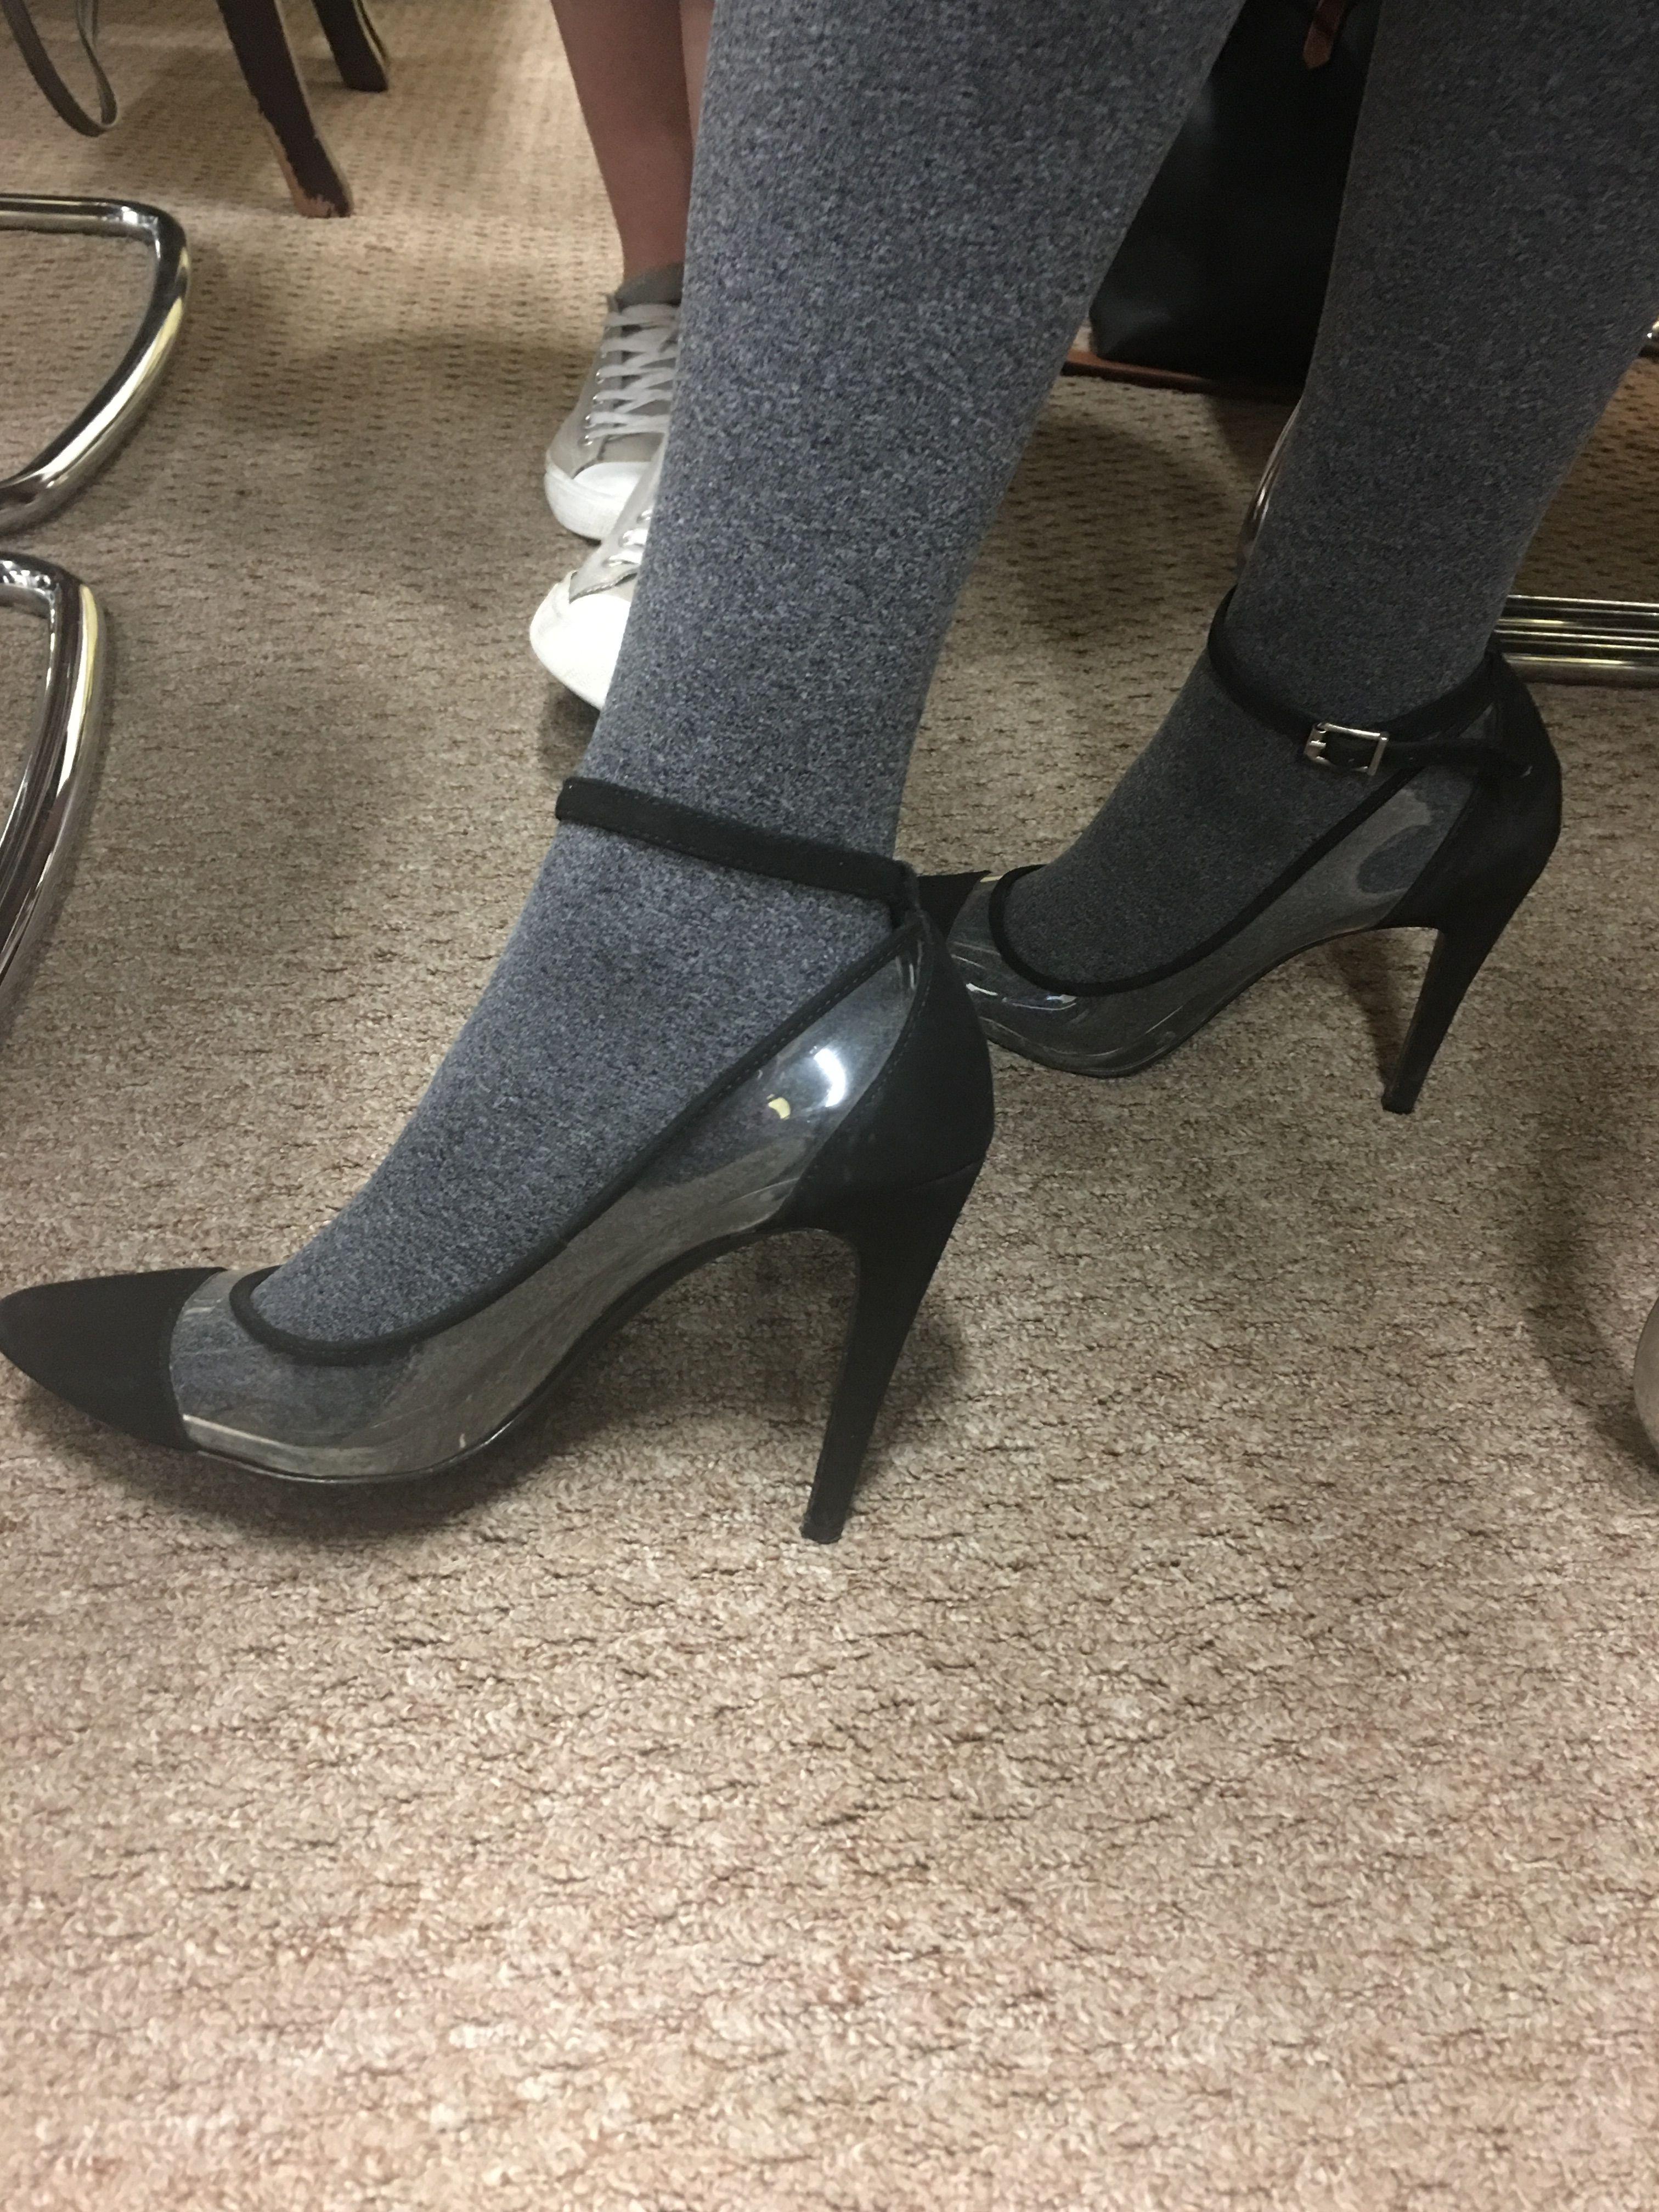 Clear Type Heels Paired W Stockings For The Fall Season Love Heels Modest Heels Kitten Heels Shoes